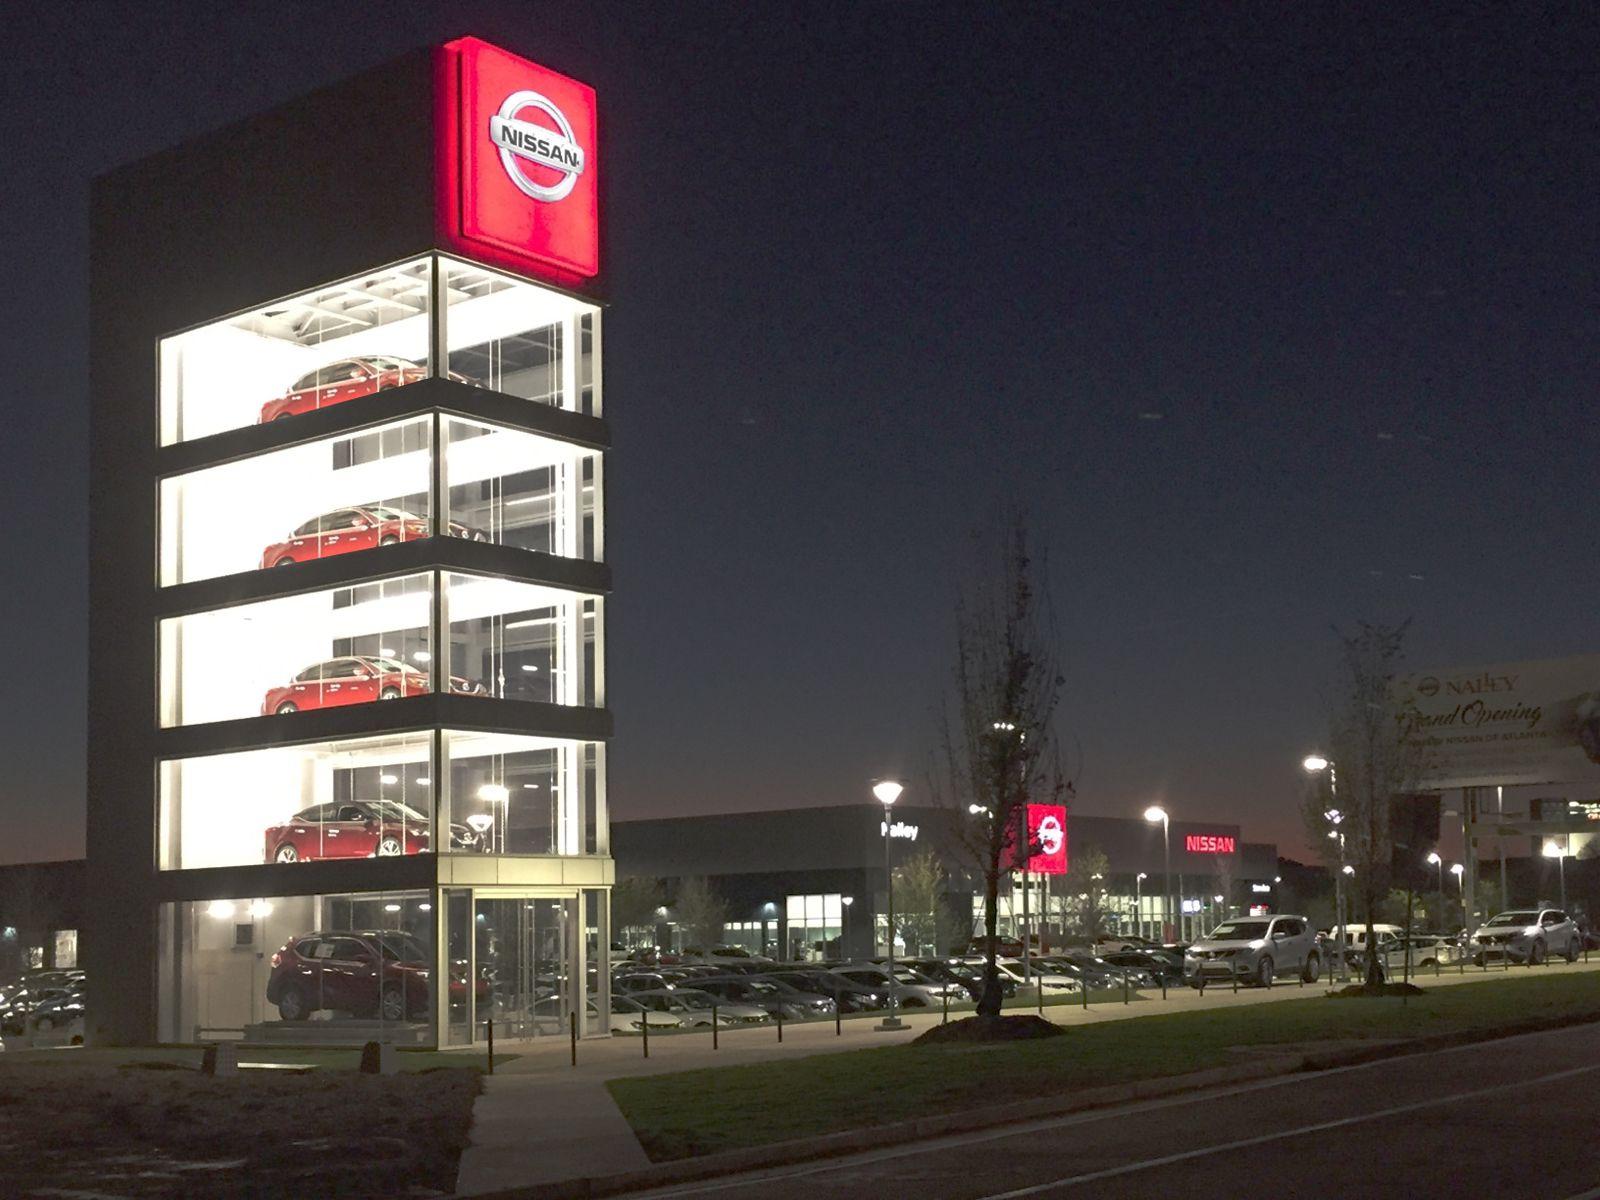 Nissan Tower Atlanta GA Auto Dealer Display Pinterest